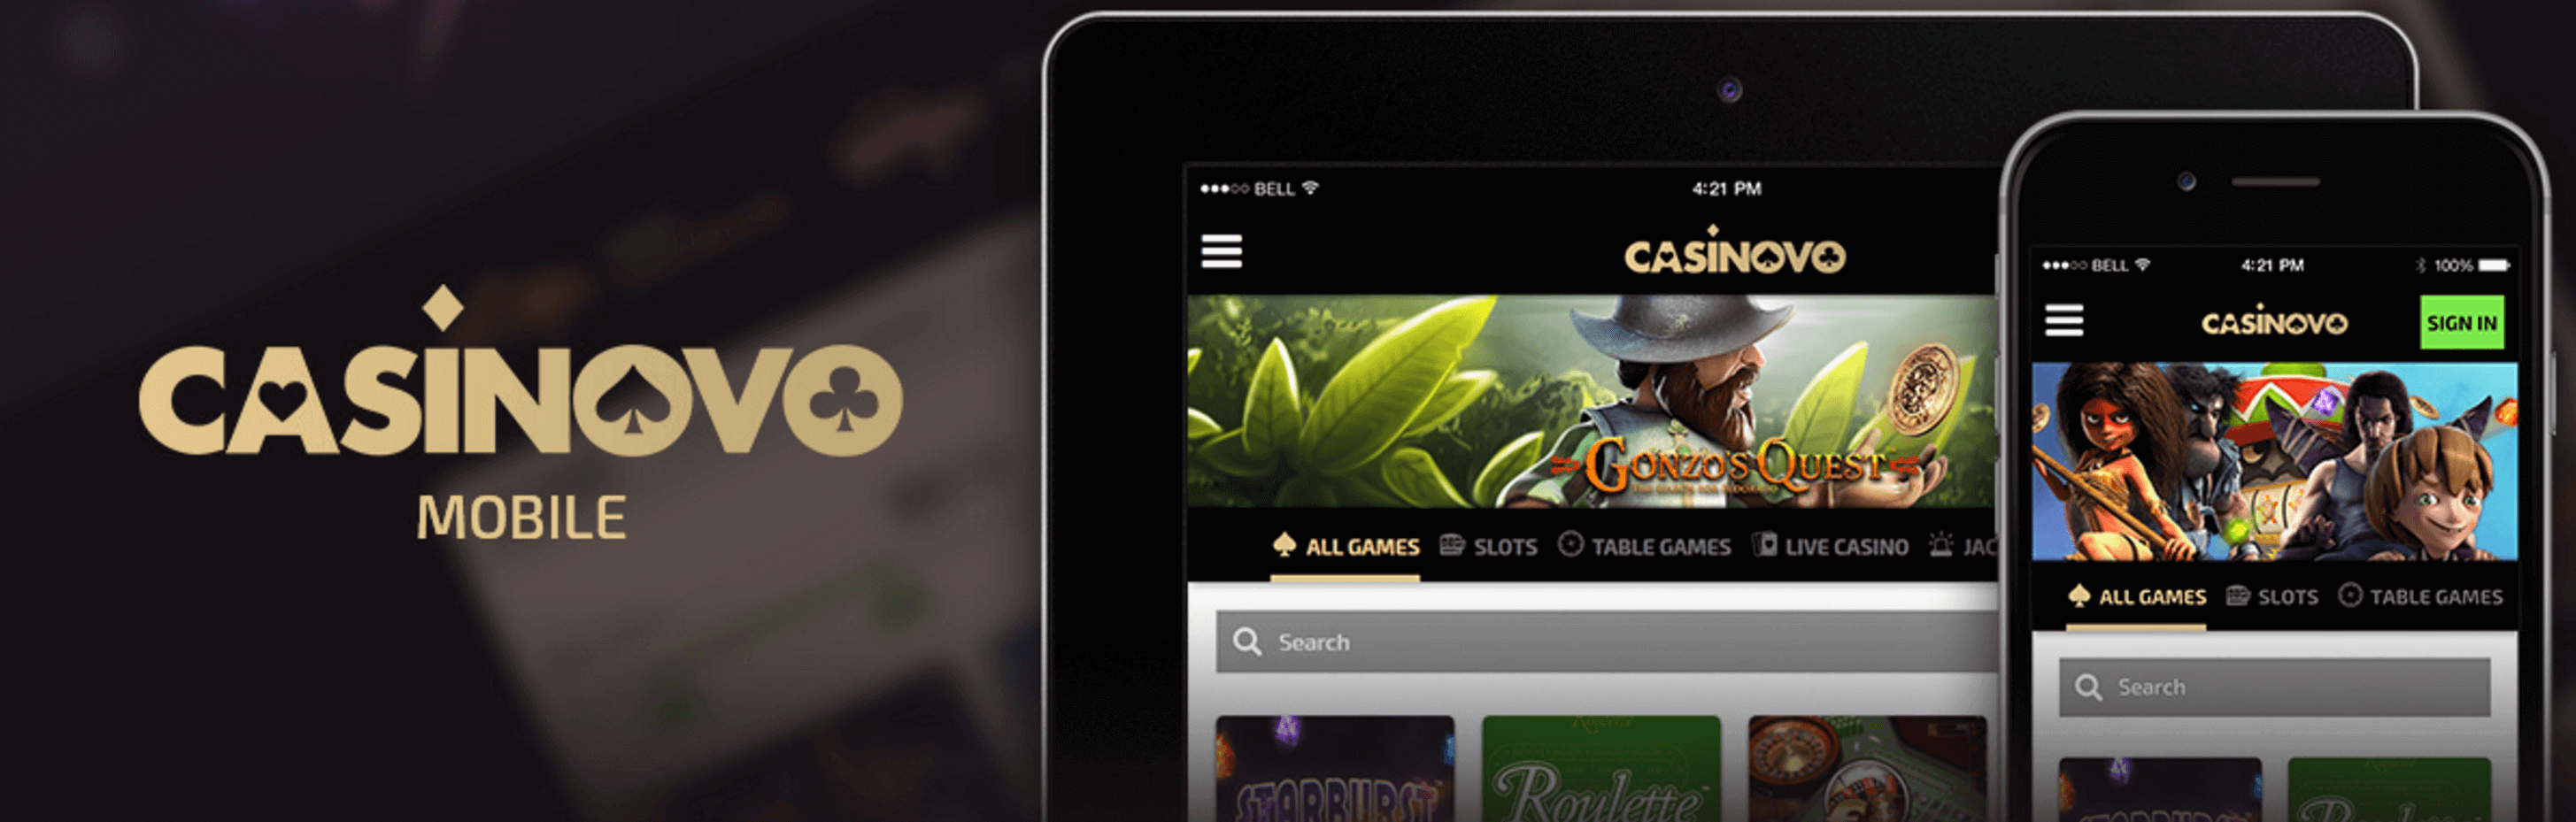 Casinovo mobile